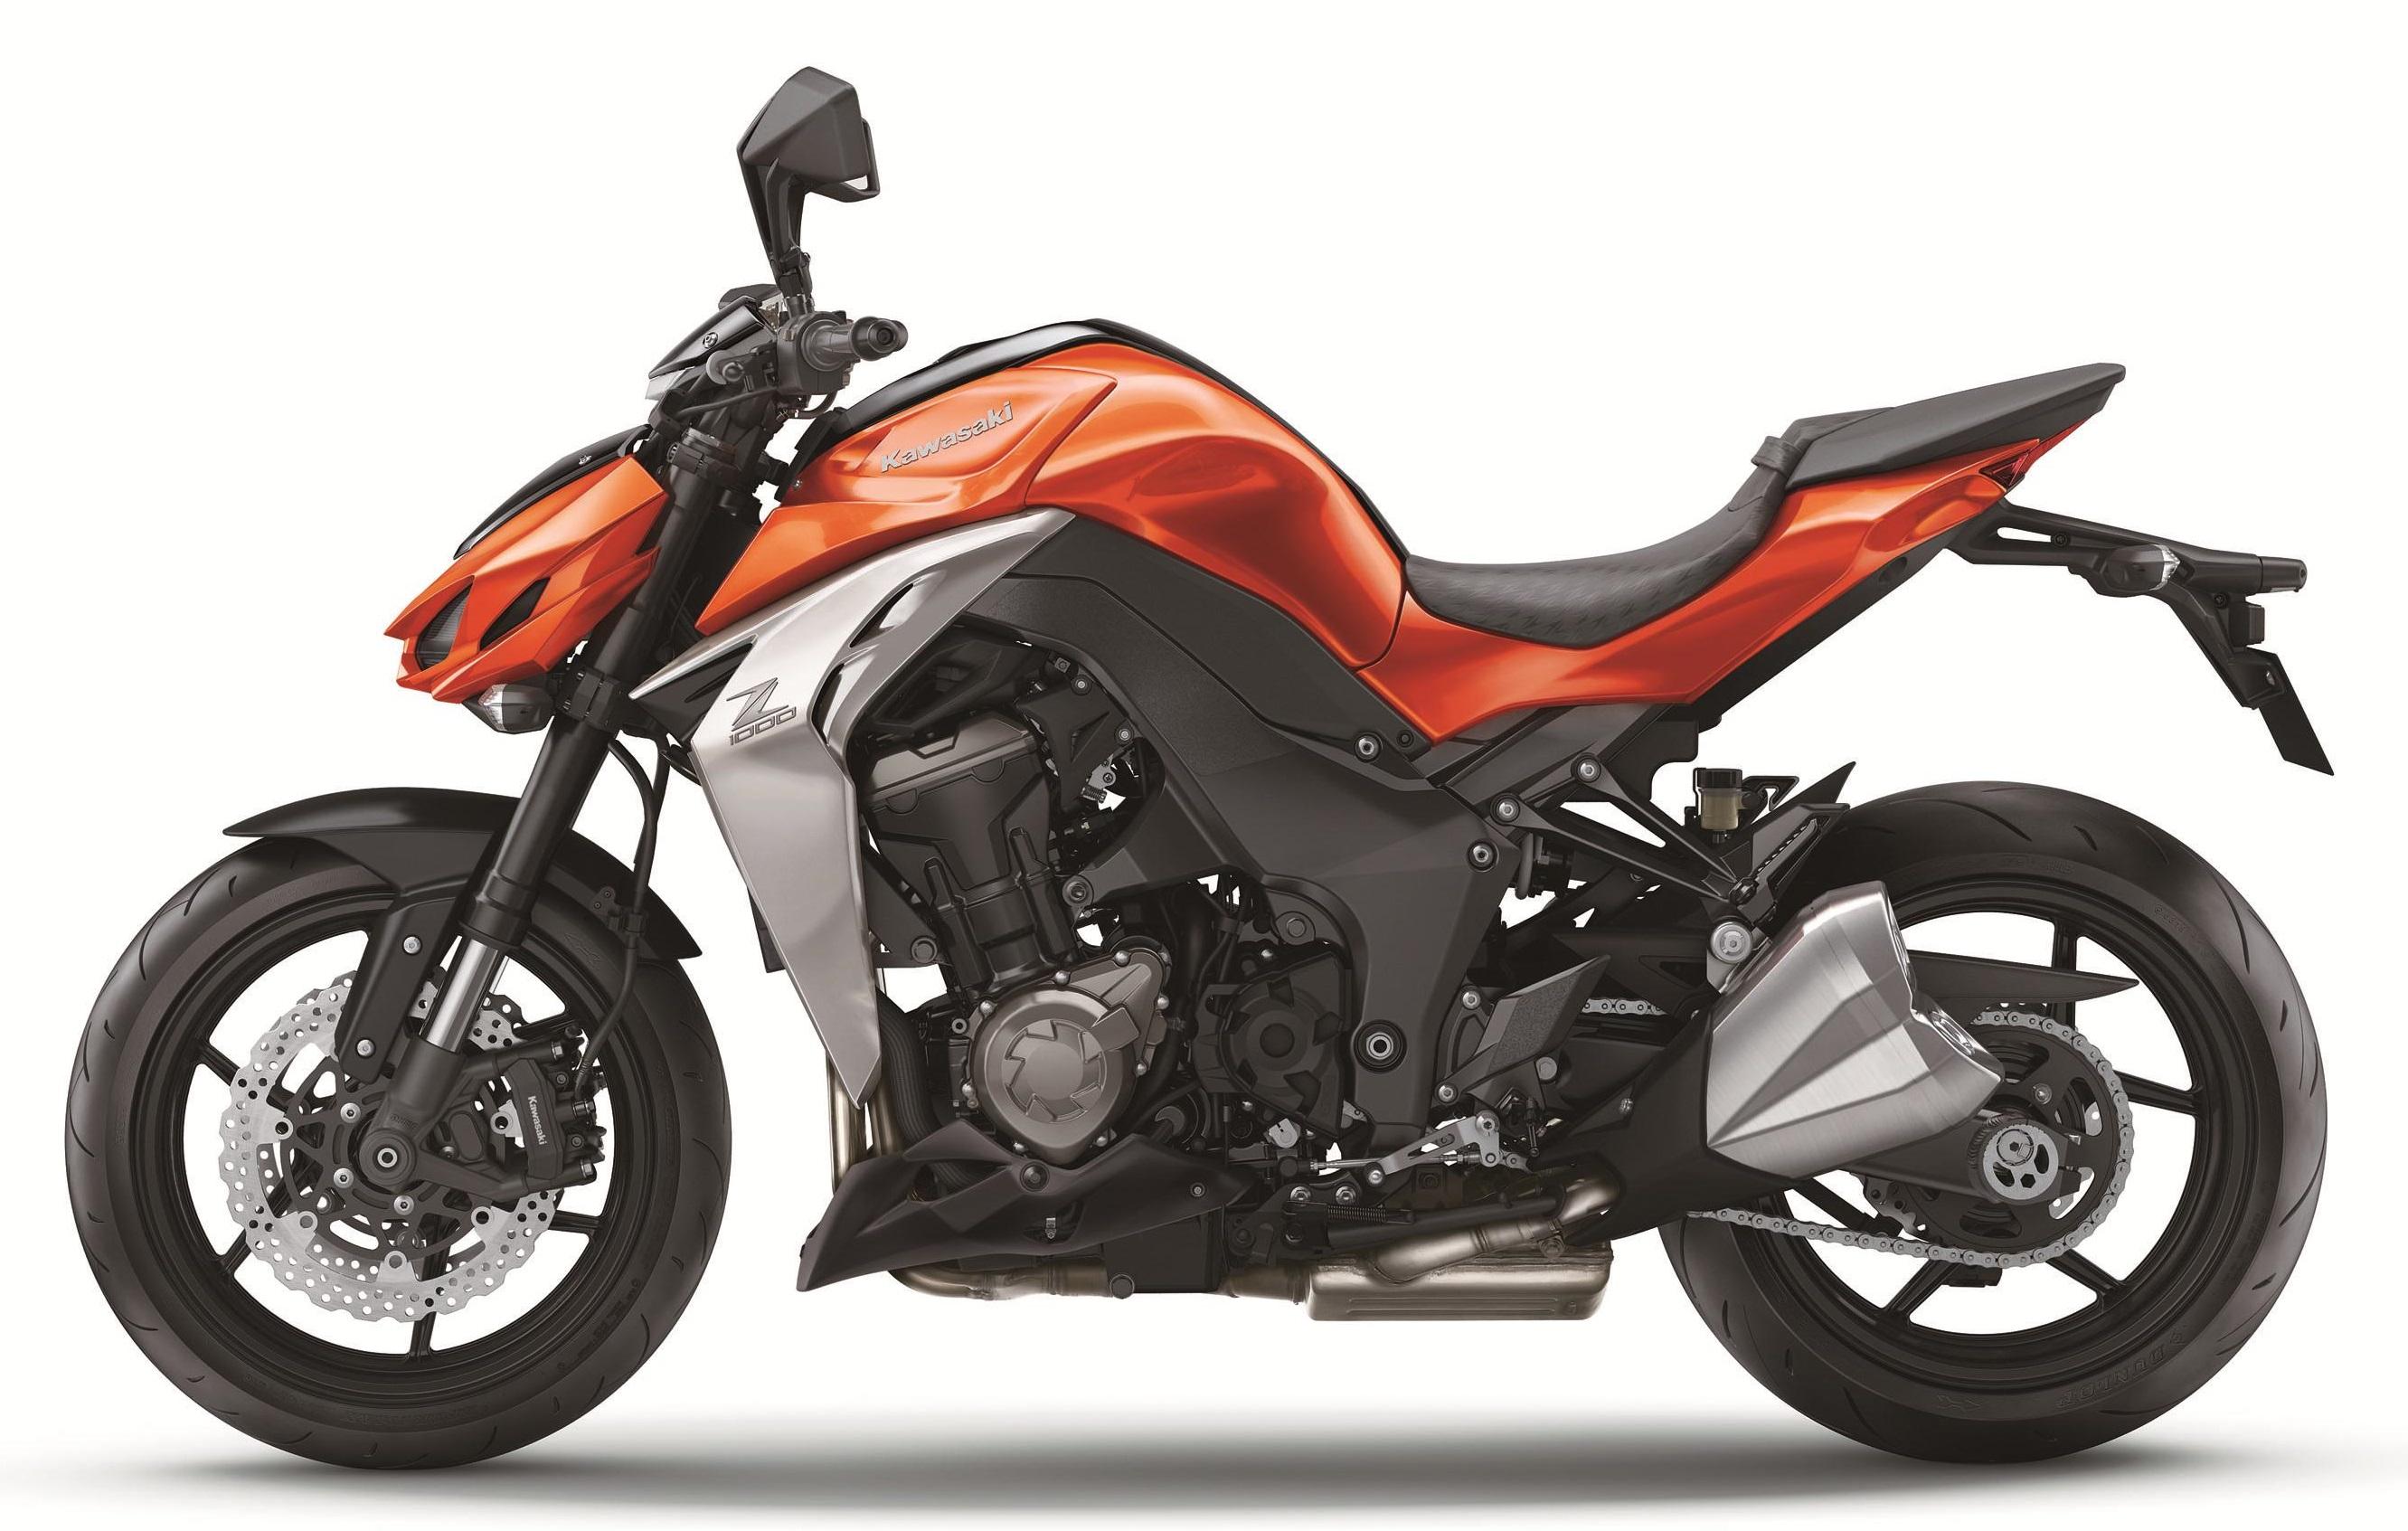 Kawasaki Z1000 O For Sale Price Guide The Bike Market